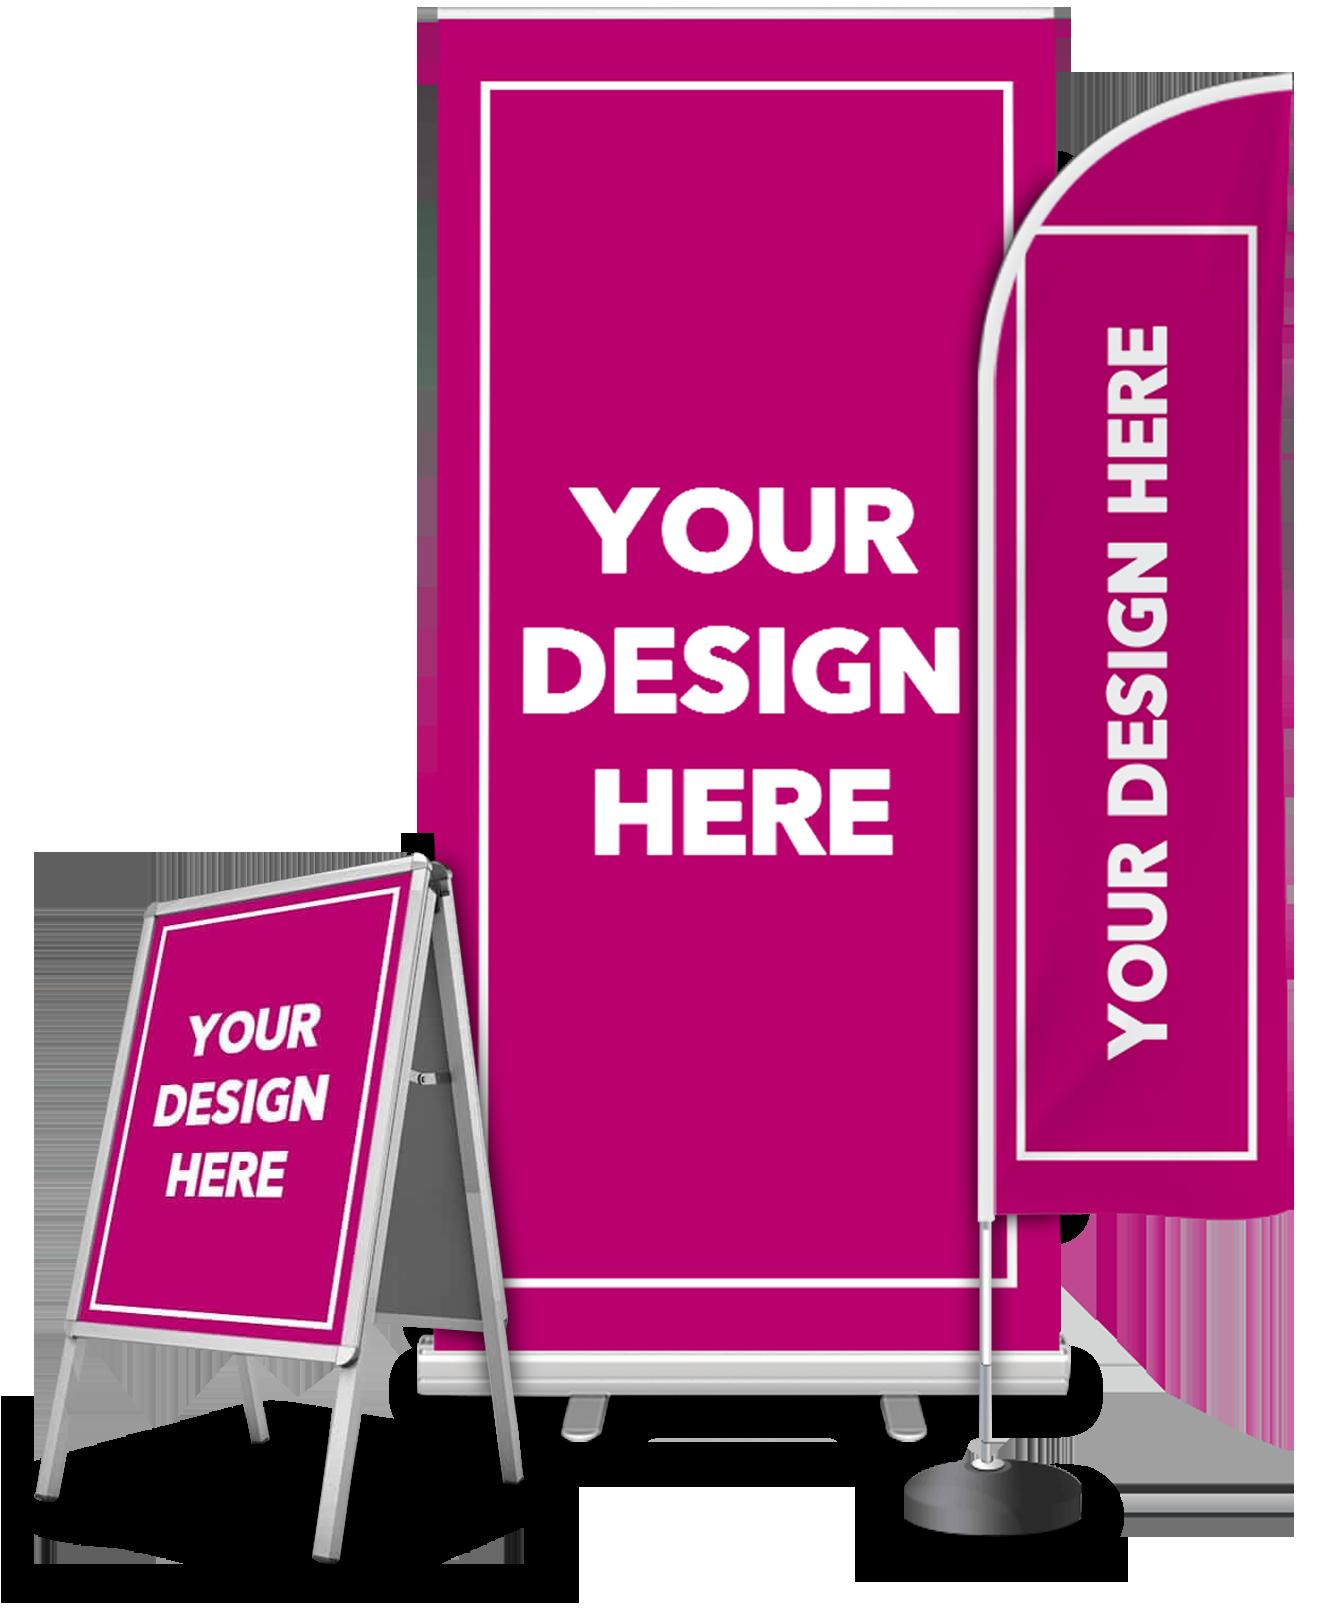 Exhibition board pop-up banner design service - website design graphic designers